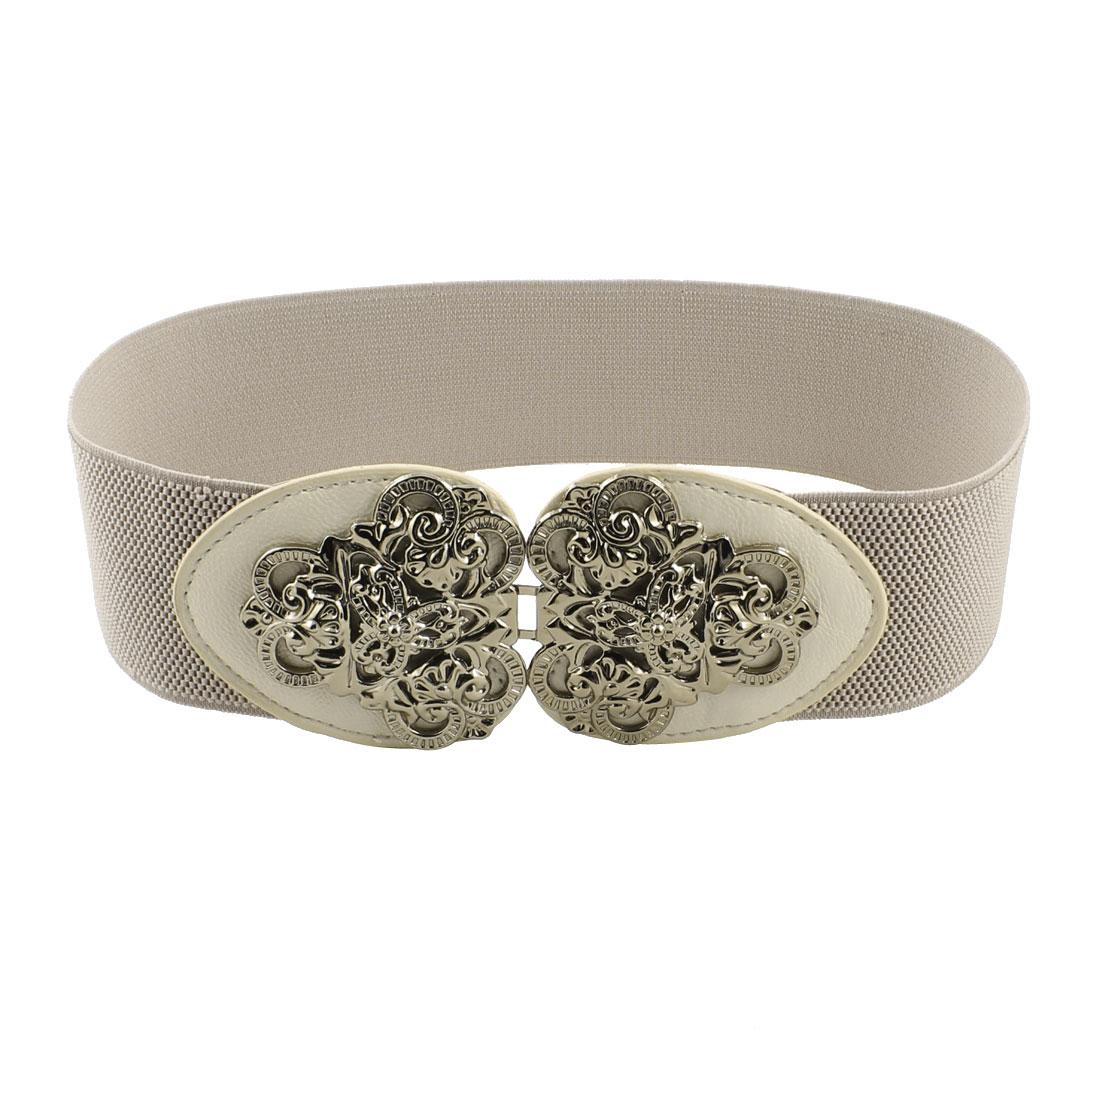 Faux Leather Interlock Buckle Stretch Gray High Waist Belt for Women